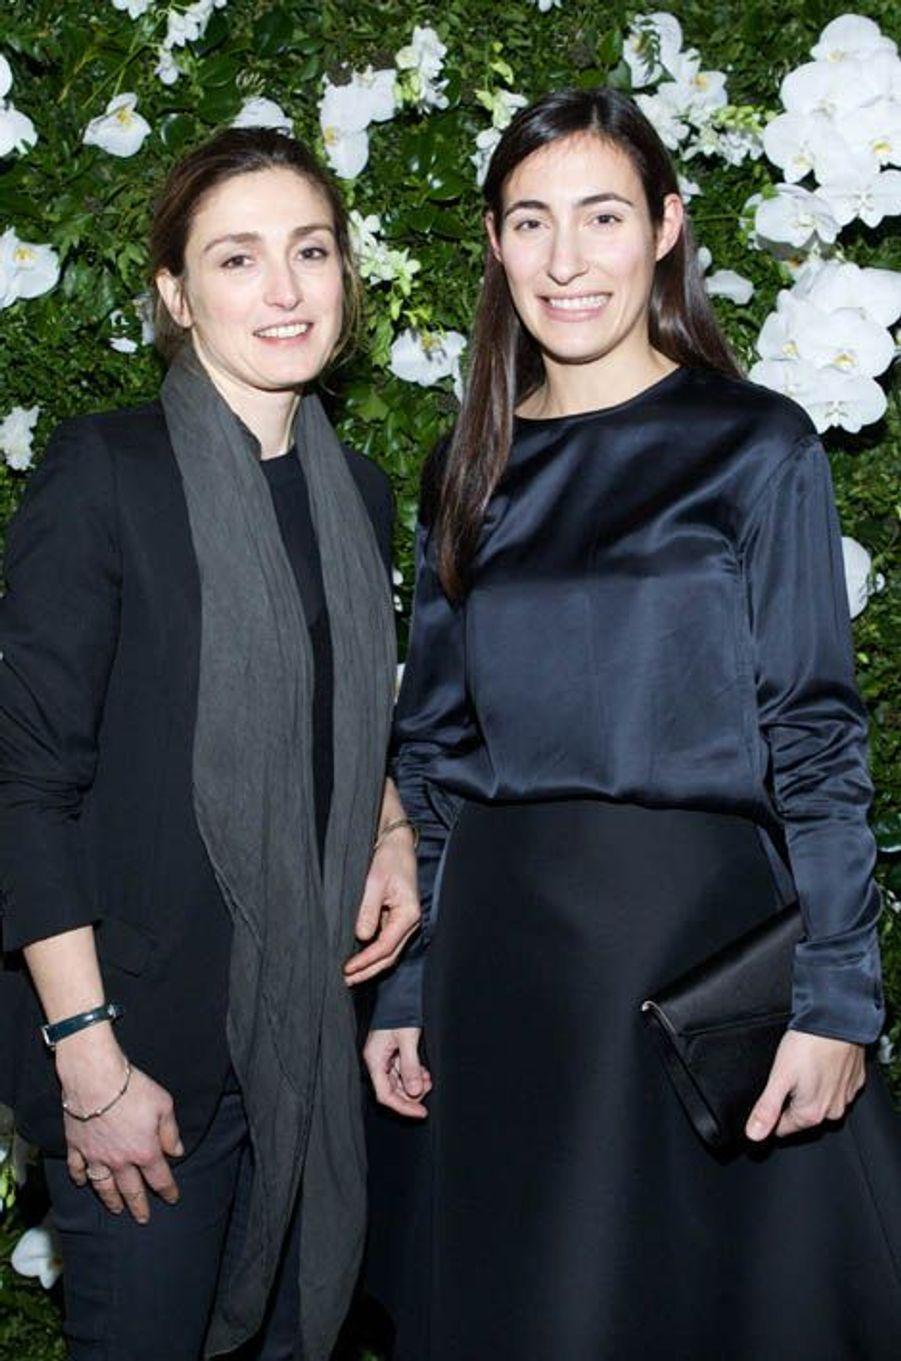 Julie Gayet et Charlotte Dauphin de la Rochefoucauld